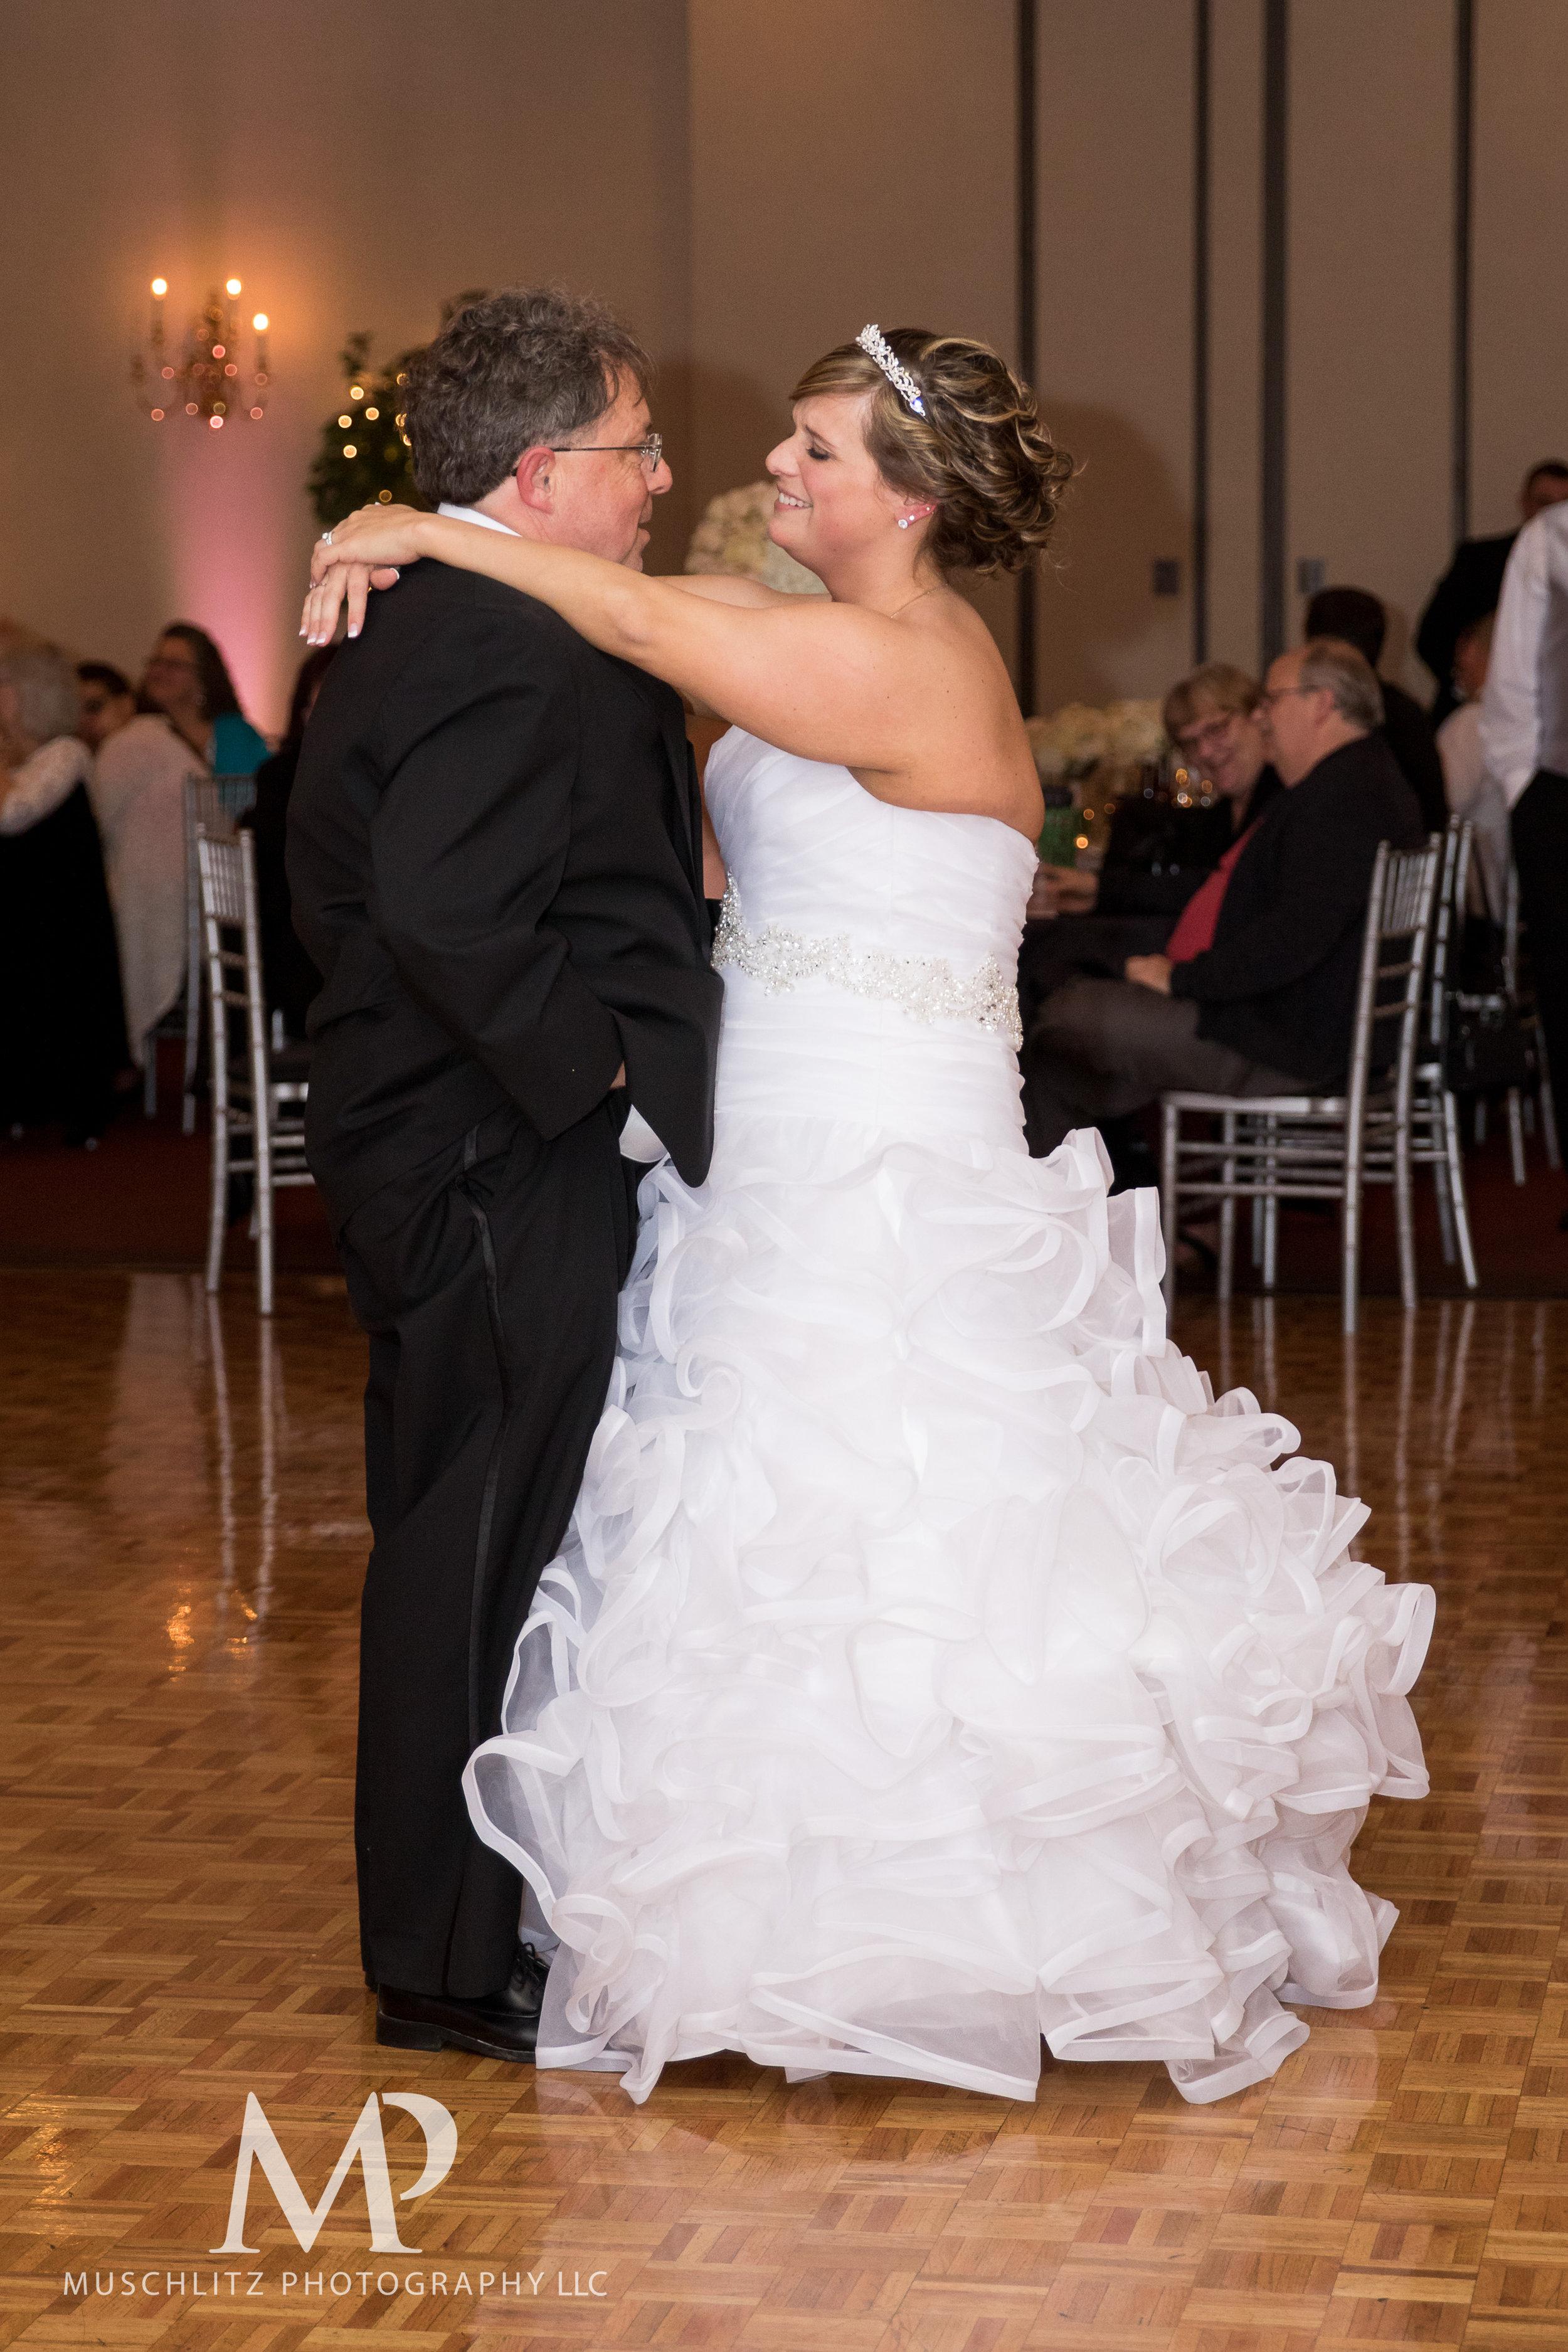 annunciation-banquet-conference-center-downtown-columbus-wedding-reception-downtown-columbus-ohio-muschlitz-photography-020.JPG